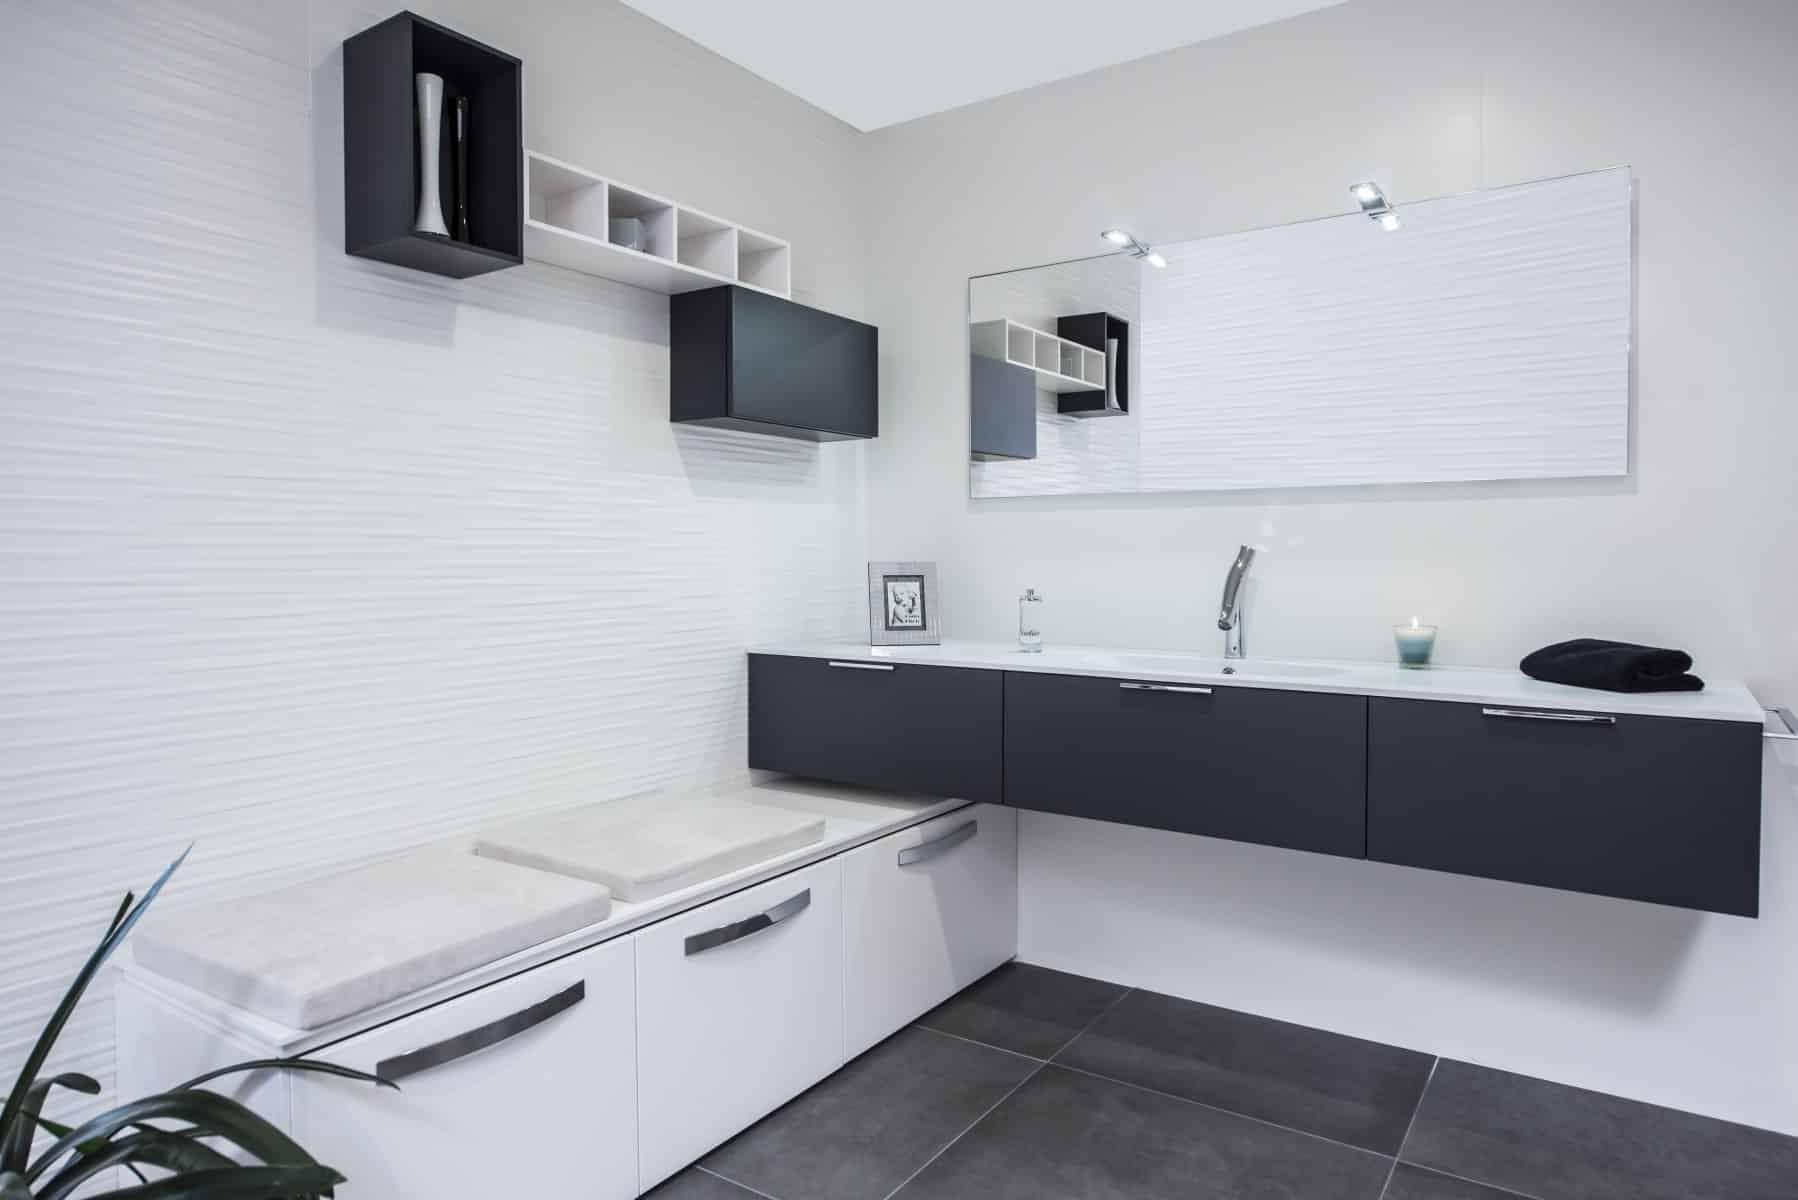 fabricant robinetterie salle de bain Show-room salle de bain